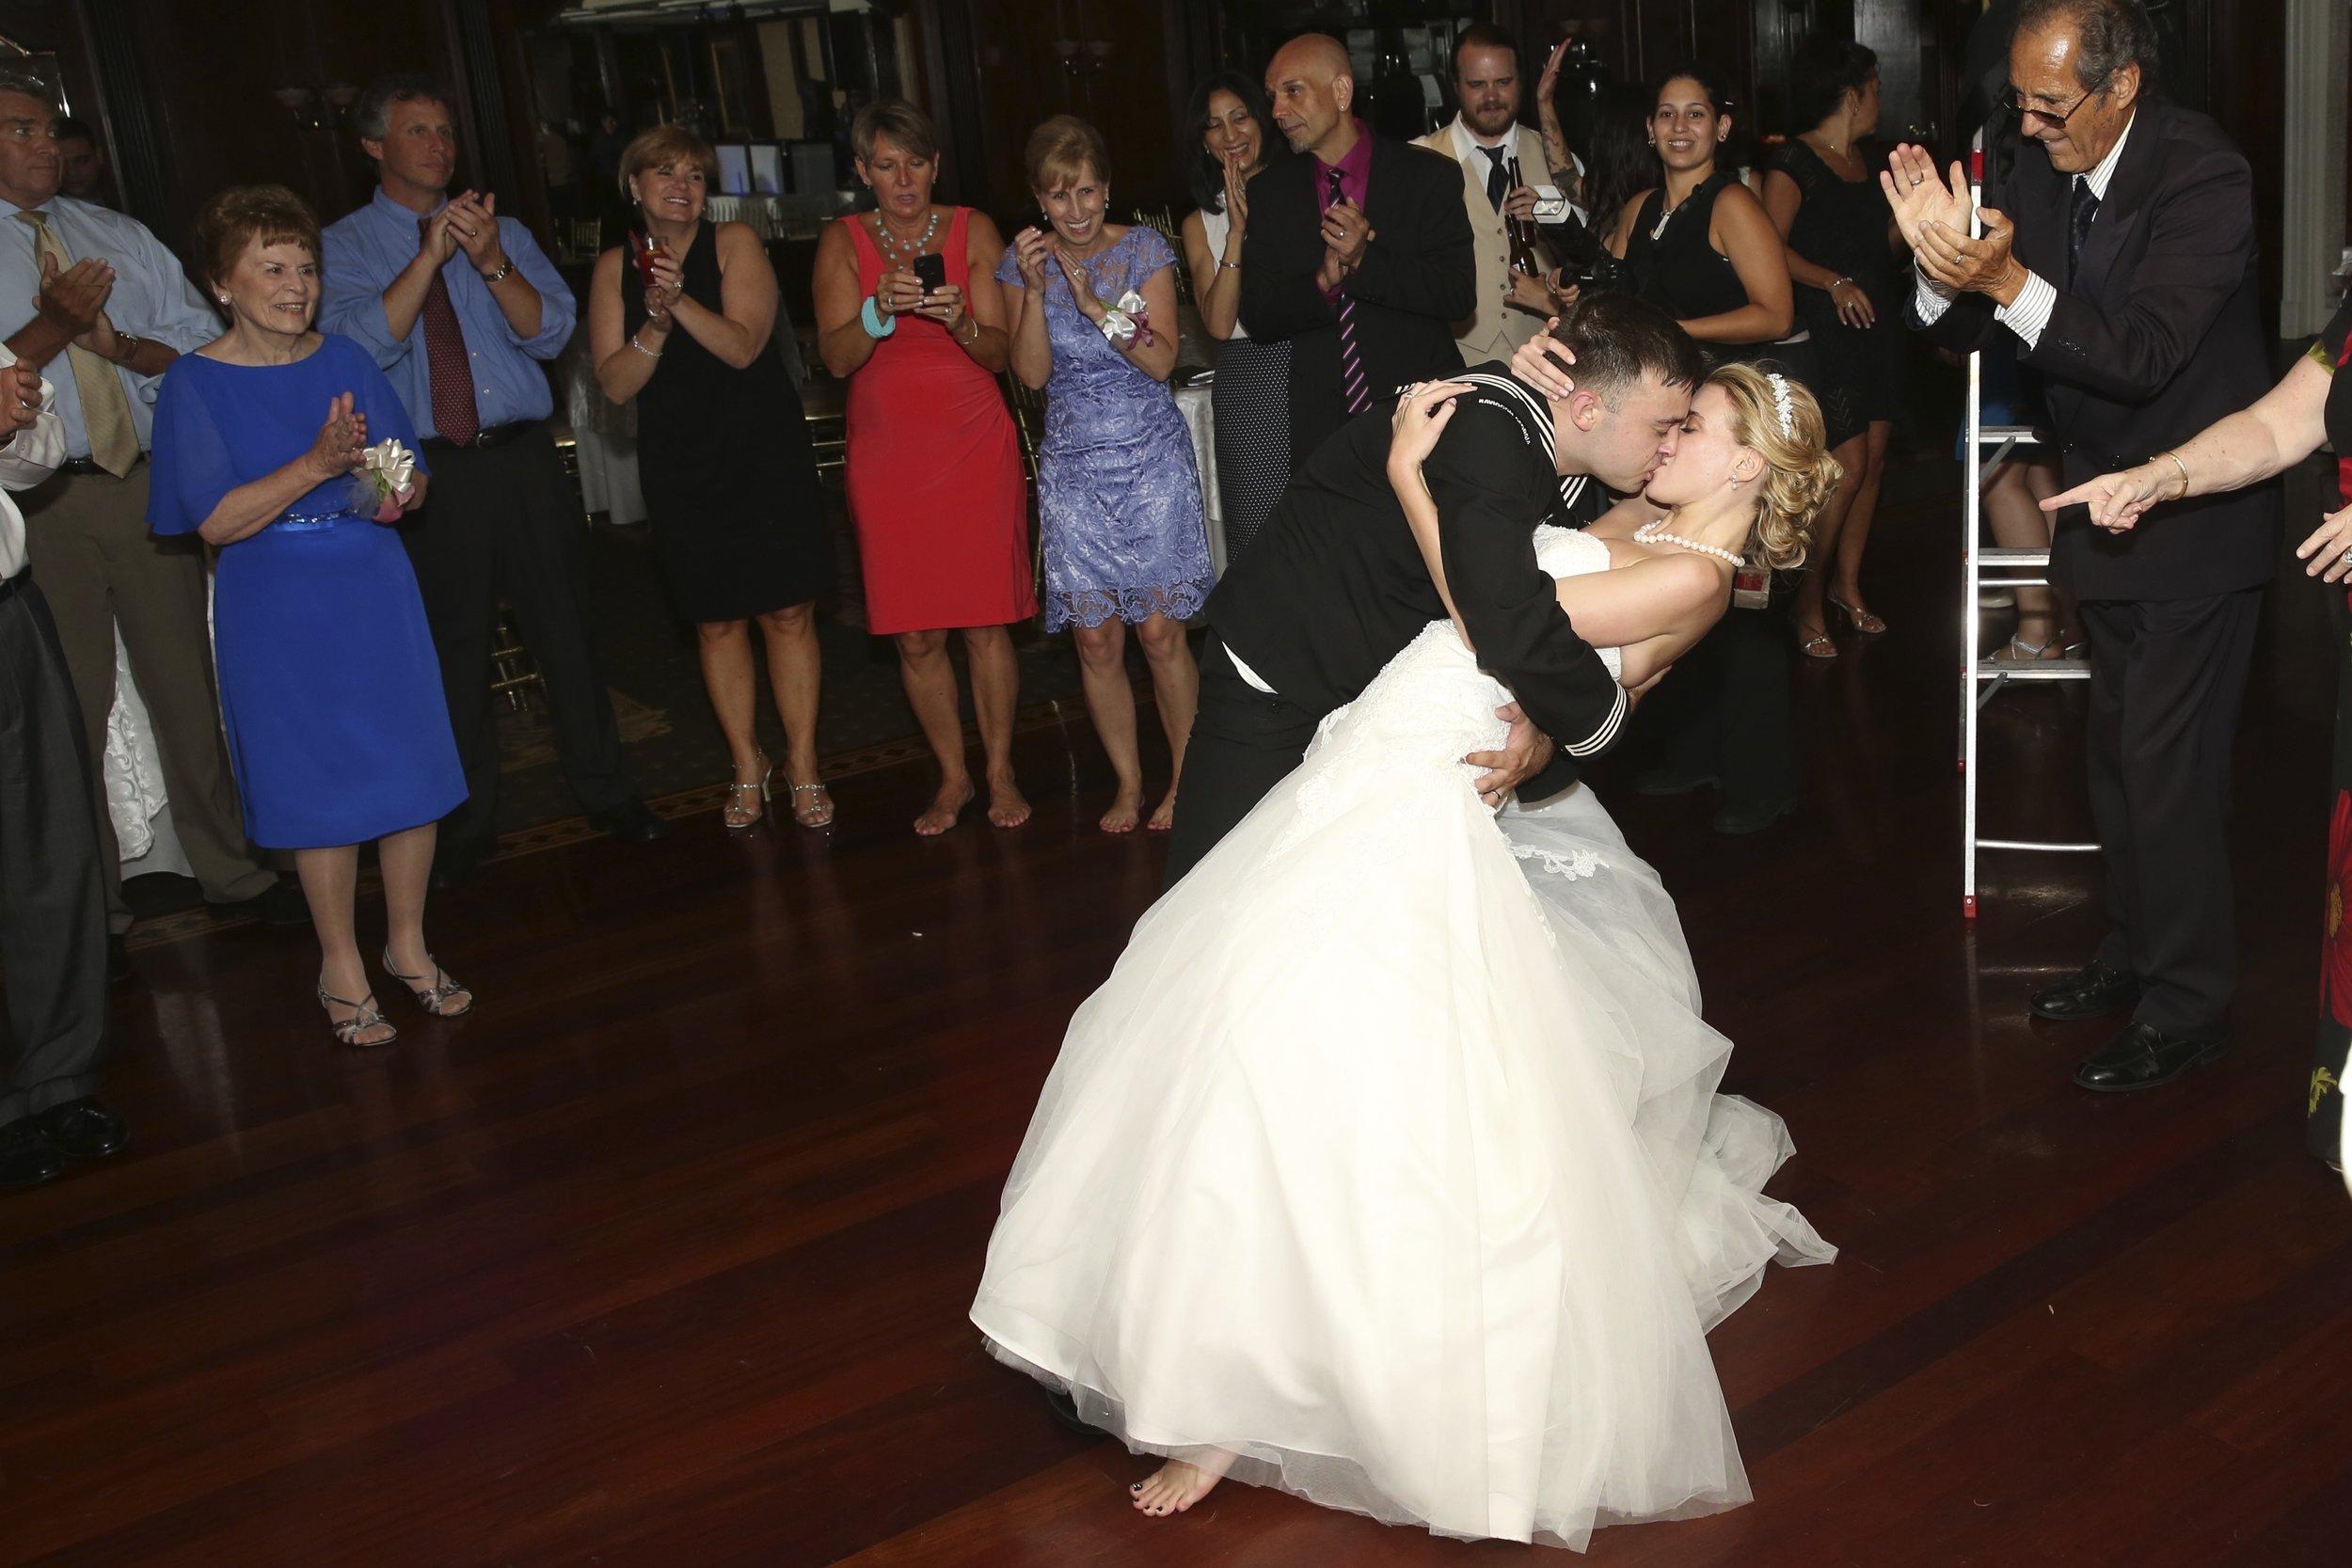 wedding kiss guests.jpg